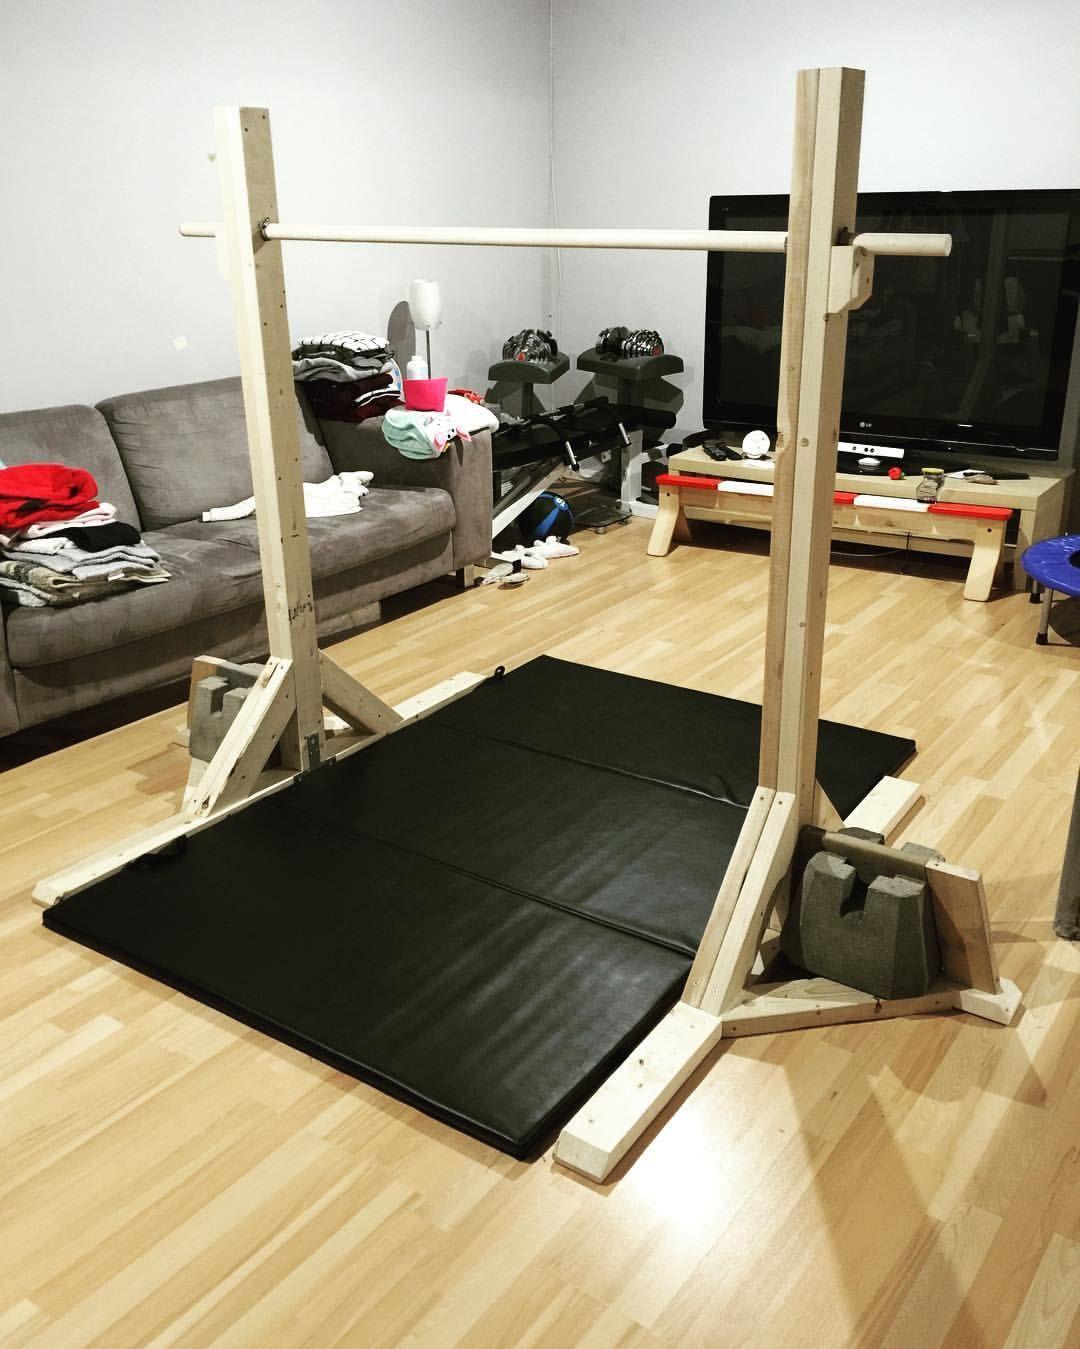 Philip Ywg On Instagram Gymnastics Bar Diy Rona Homeproject